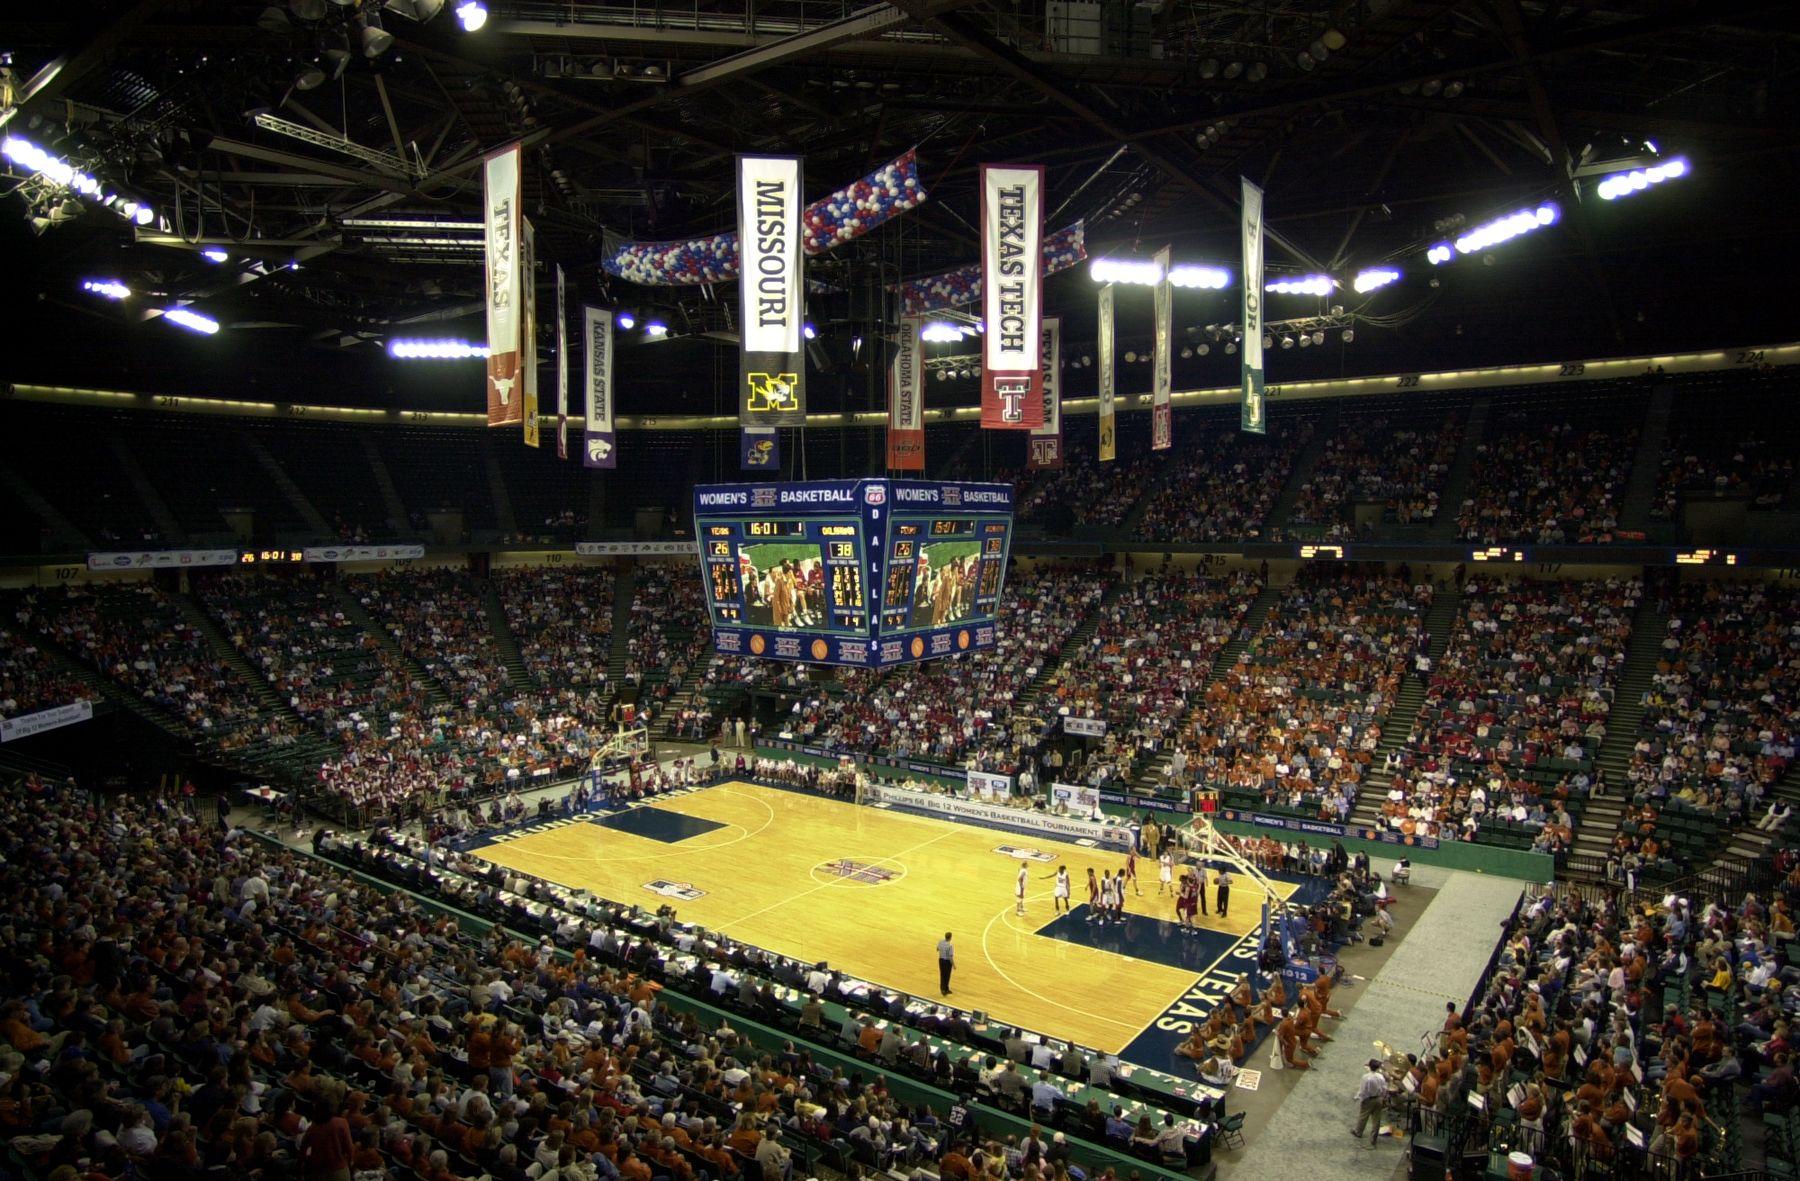 Big 12 Basketball Sprint Center Kansas City Basketball Kansas